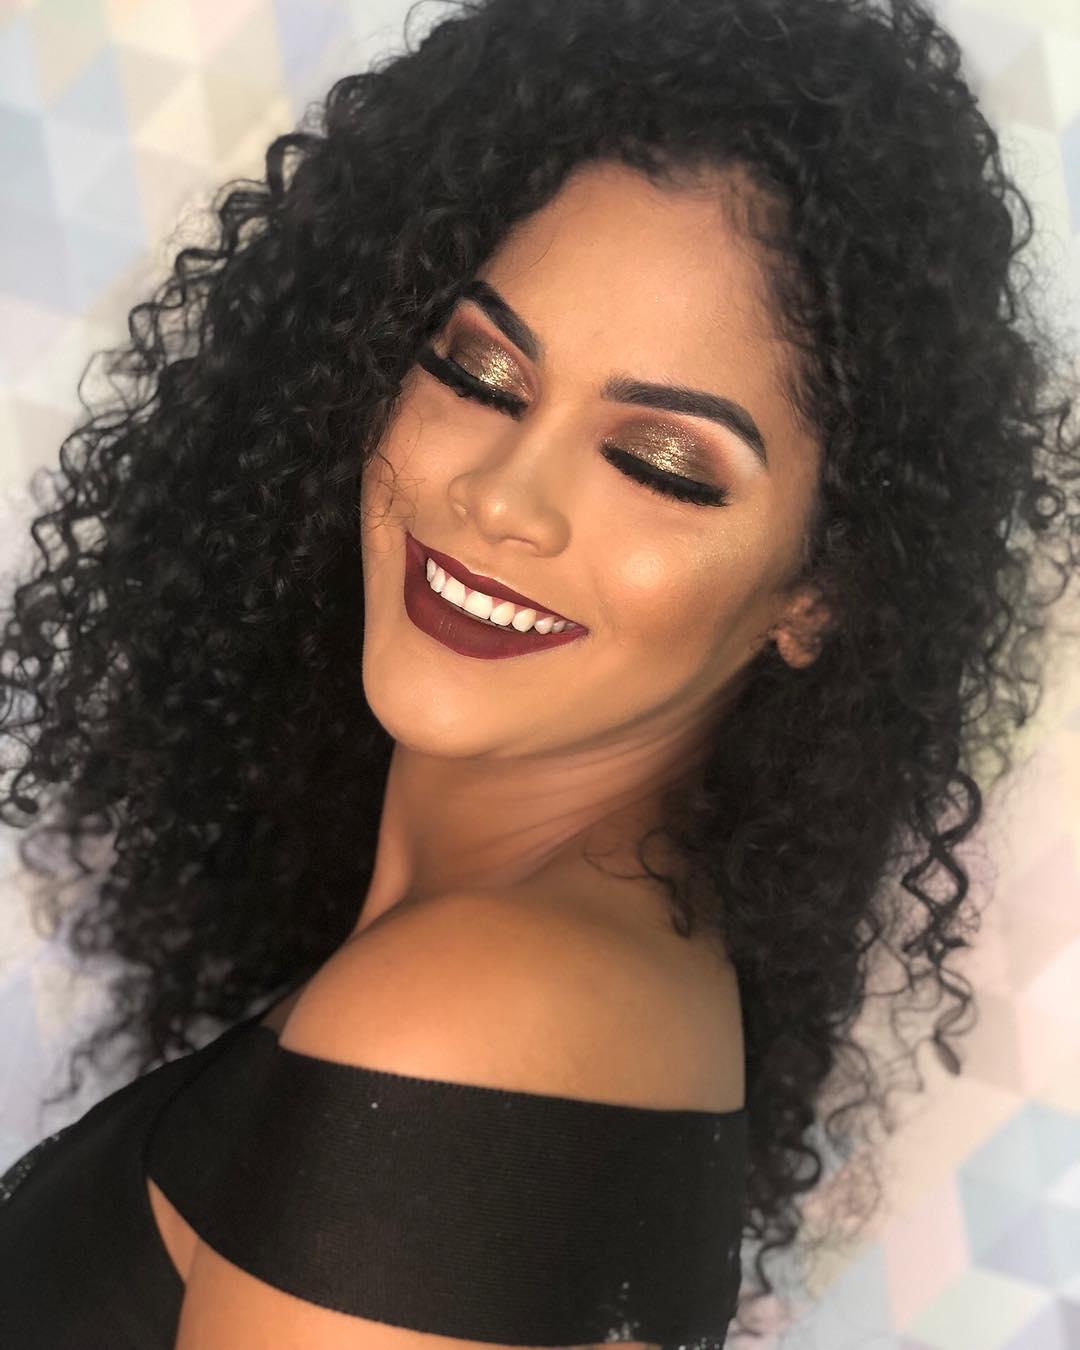 roberlania viana, candidata ao miss piaui 2019. 45949910